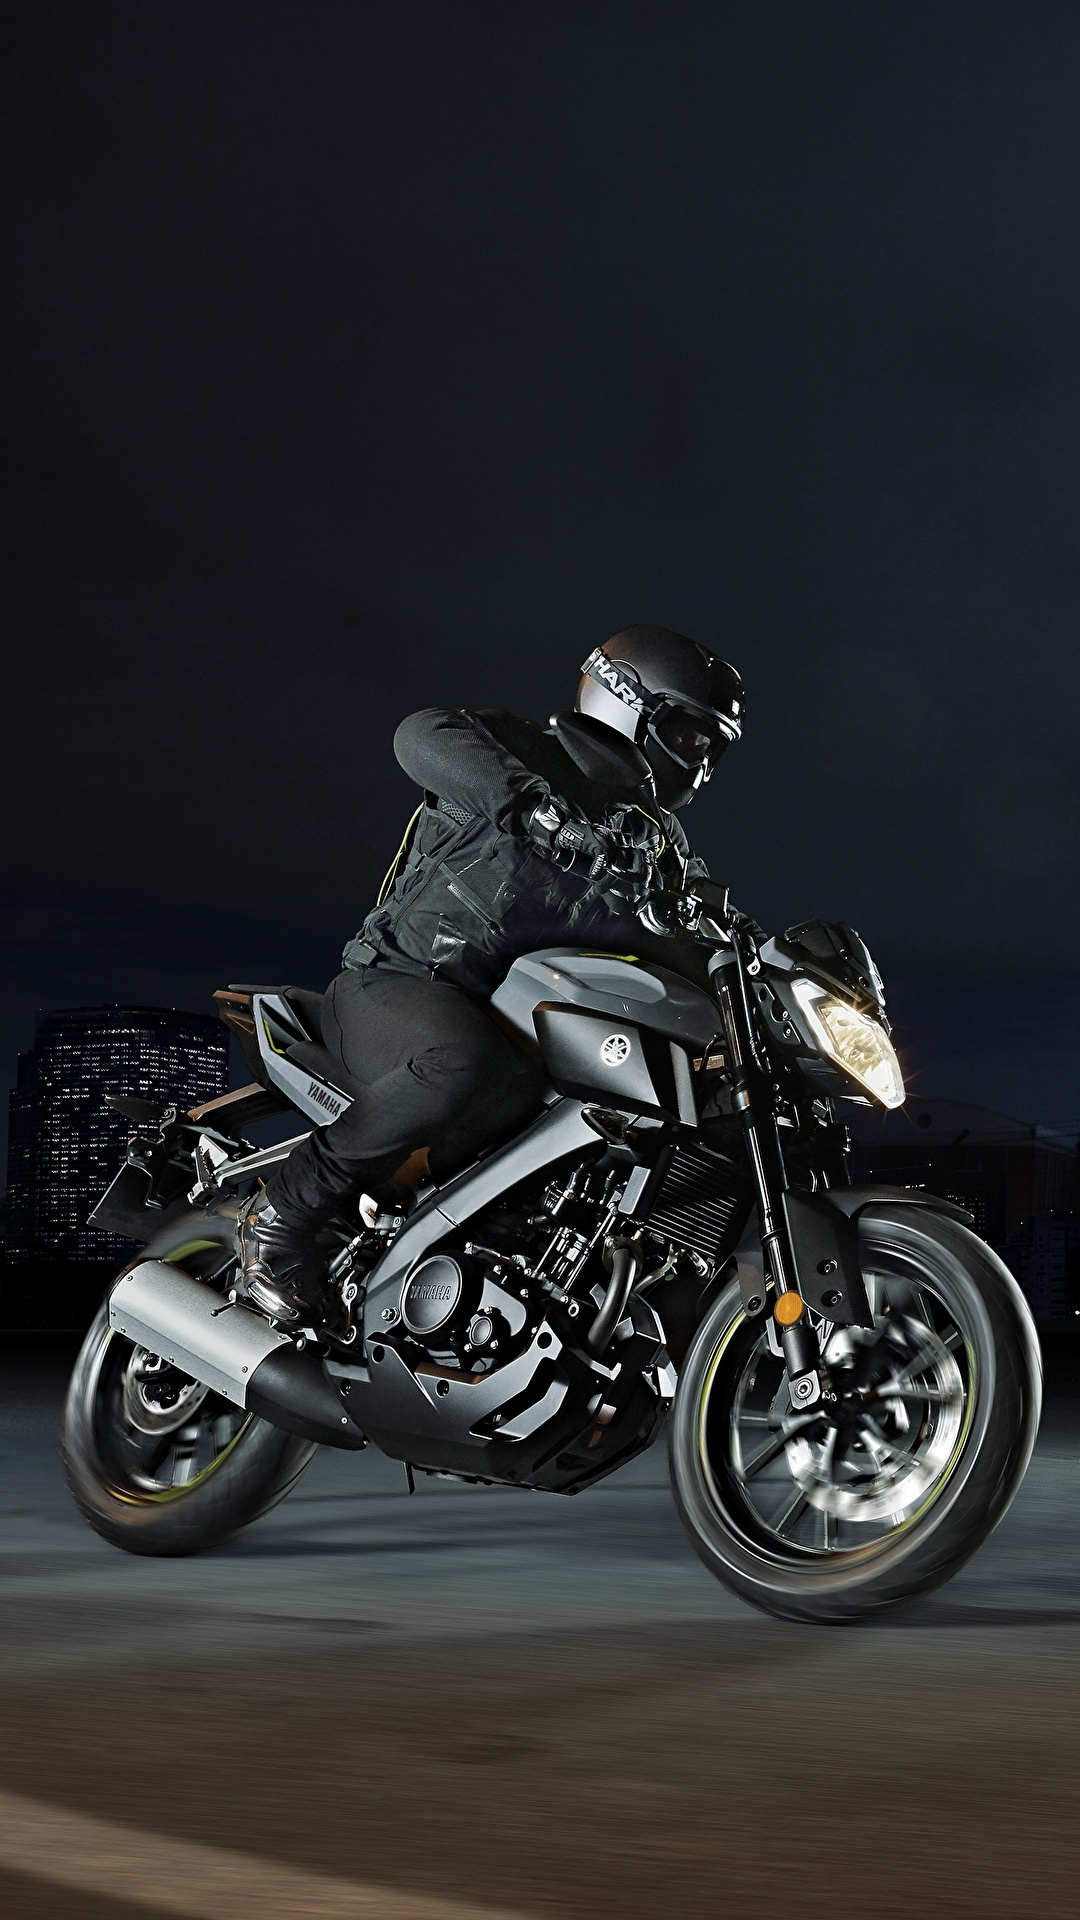 Wallpaper Yamaha Helmet 2016 17 Mt 125 Motorcycle 1080x1920